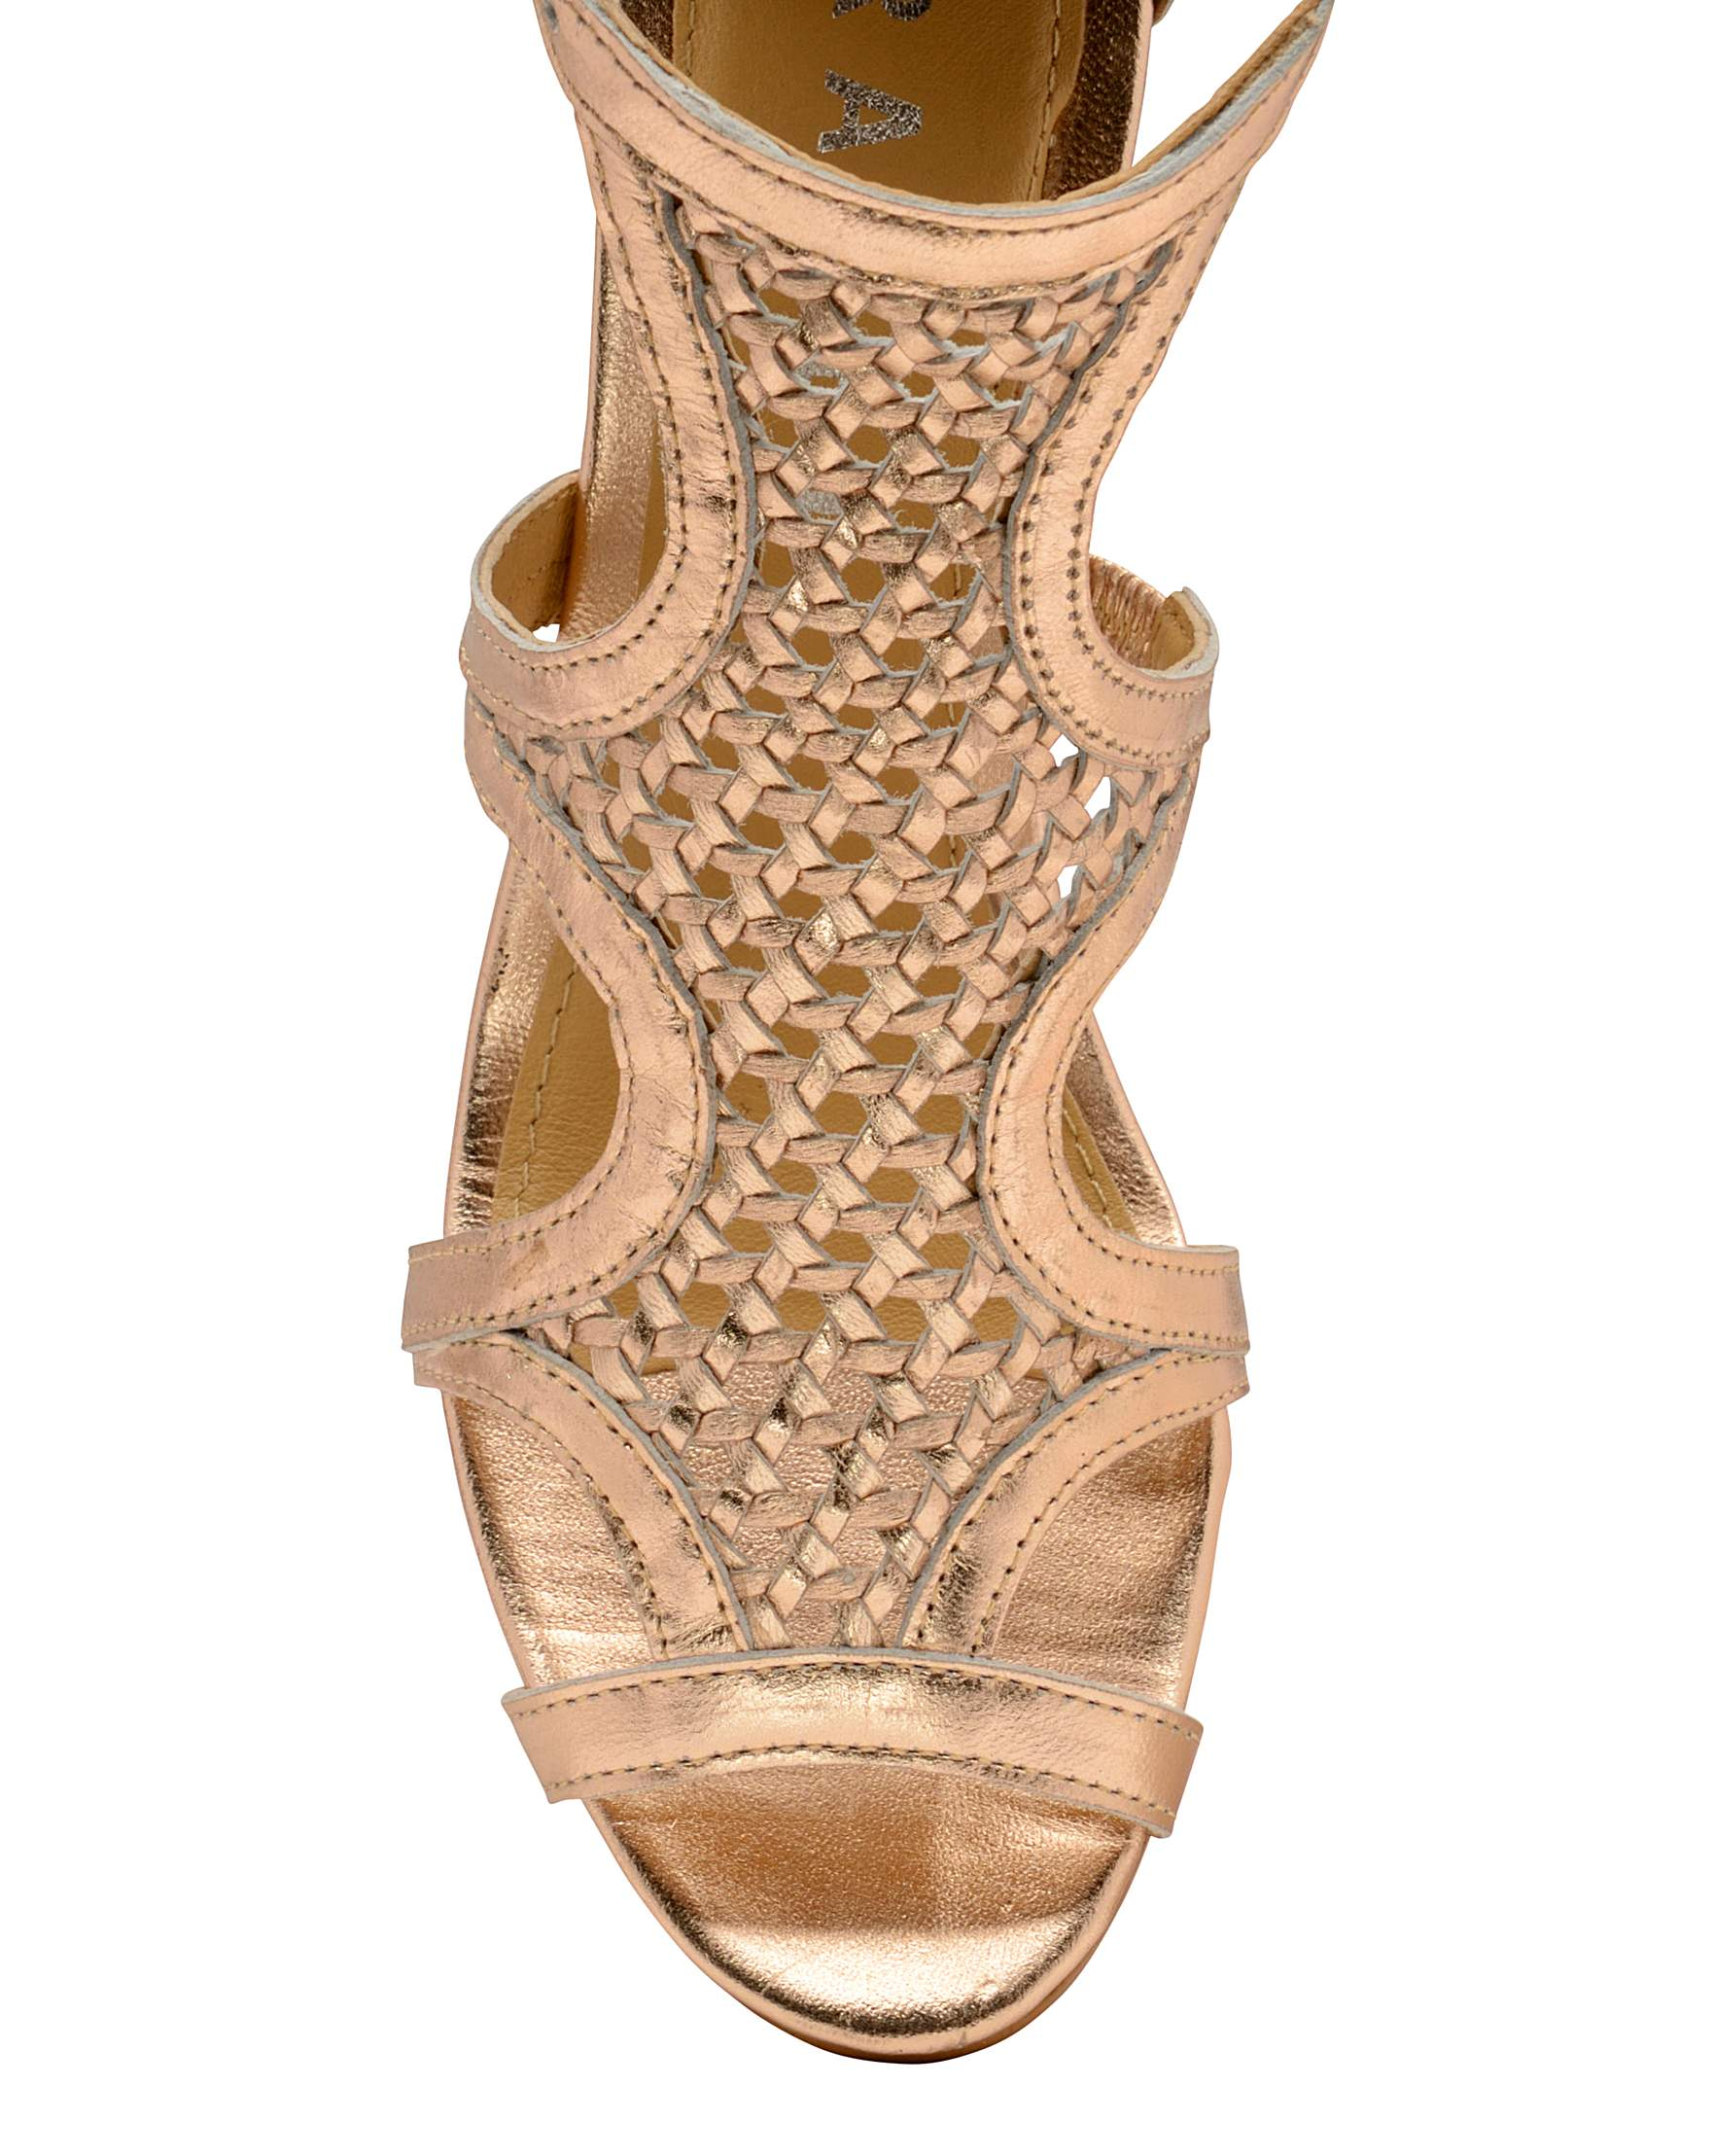 56b52e7755cb Ravel Halton Leather Heeled Sandals